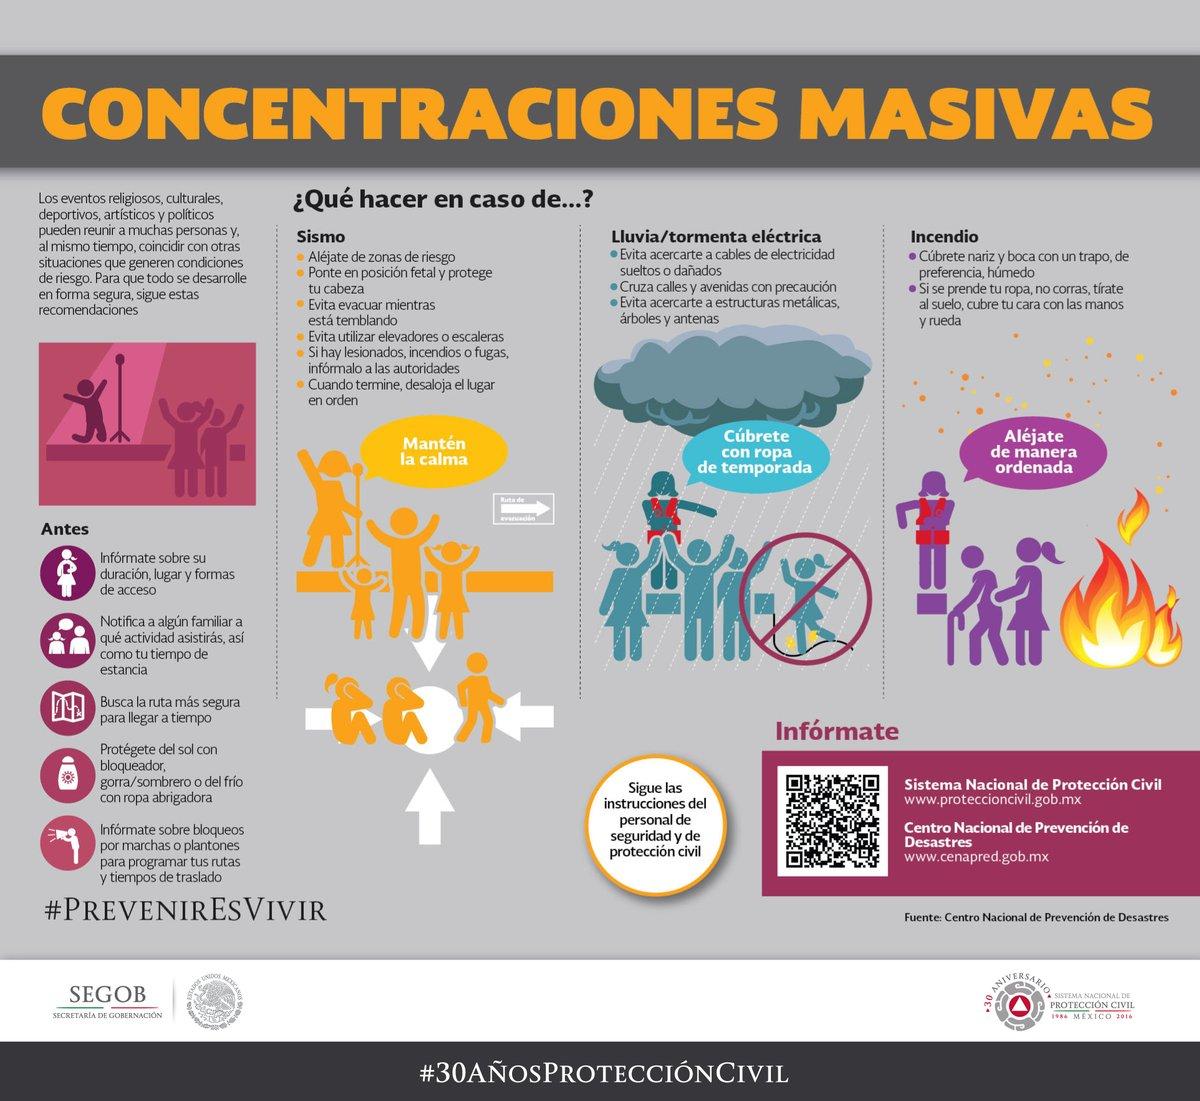 /cms/uploads/image/file/219239/recomendaciones_para_eventos_maasivos.jpg